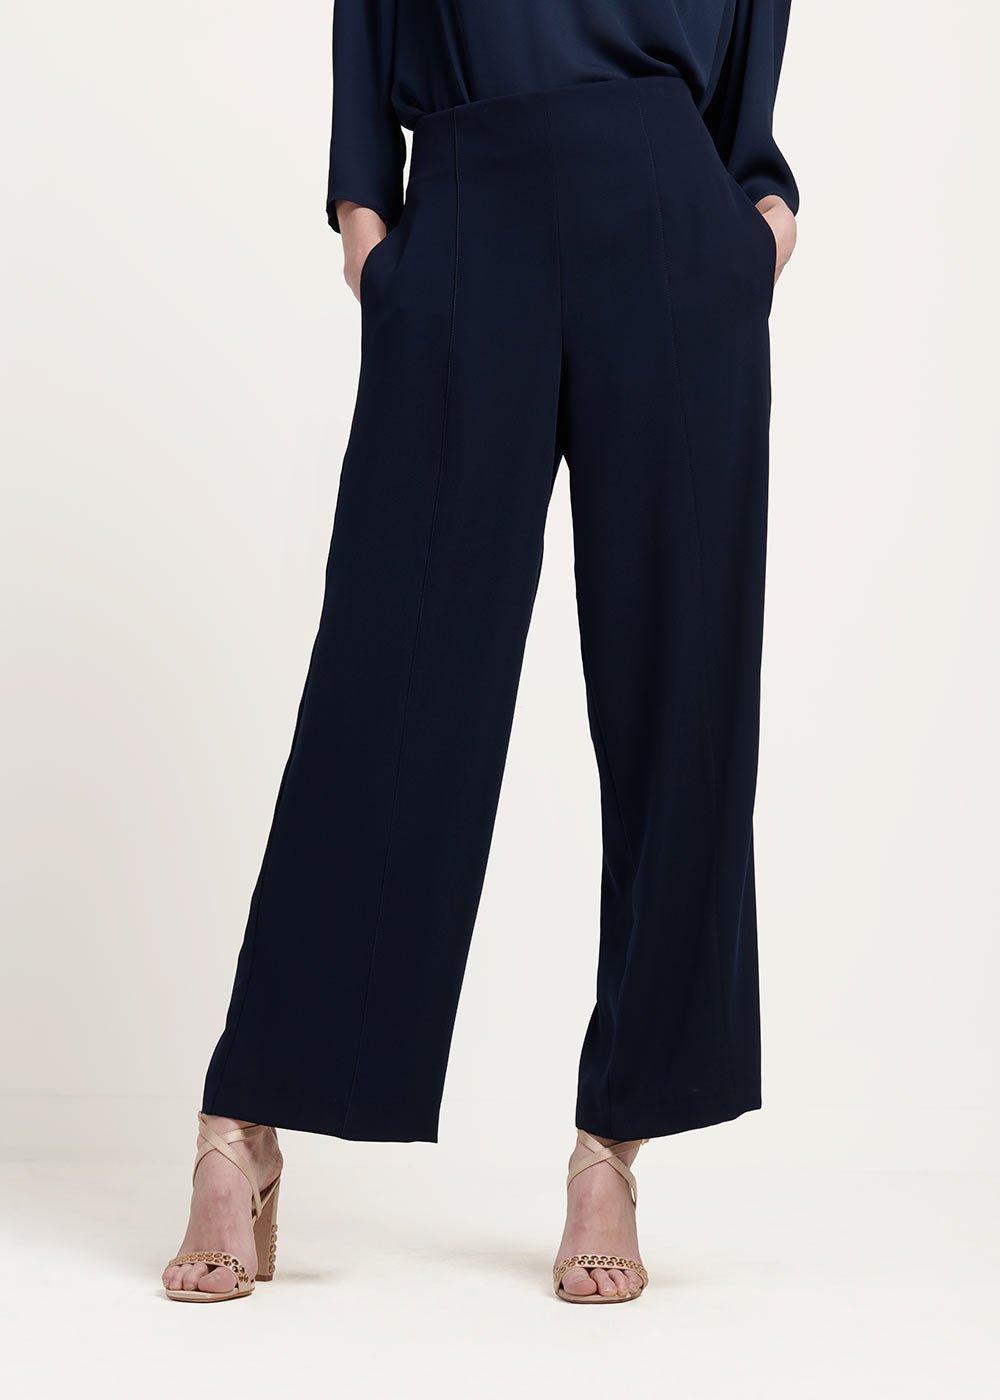 Pantalone Pamel in tessuto cady - Blue Navy - Donna